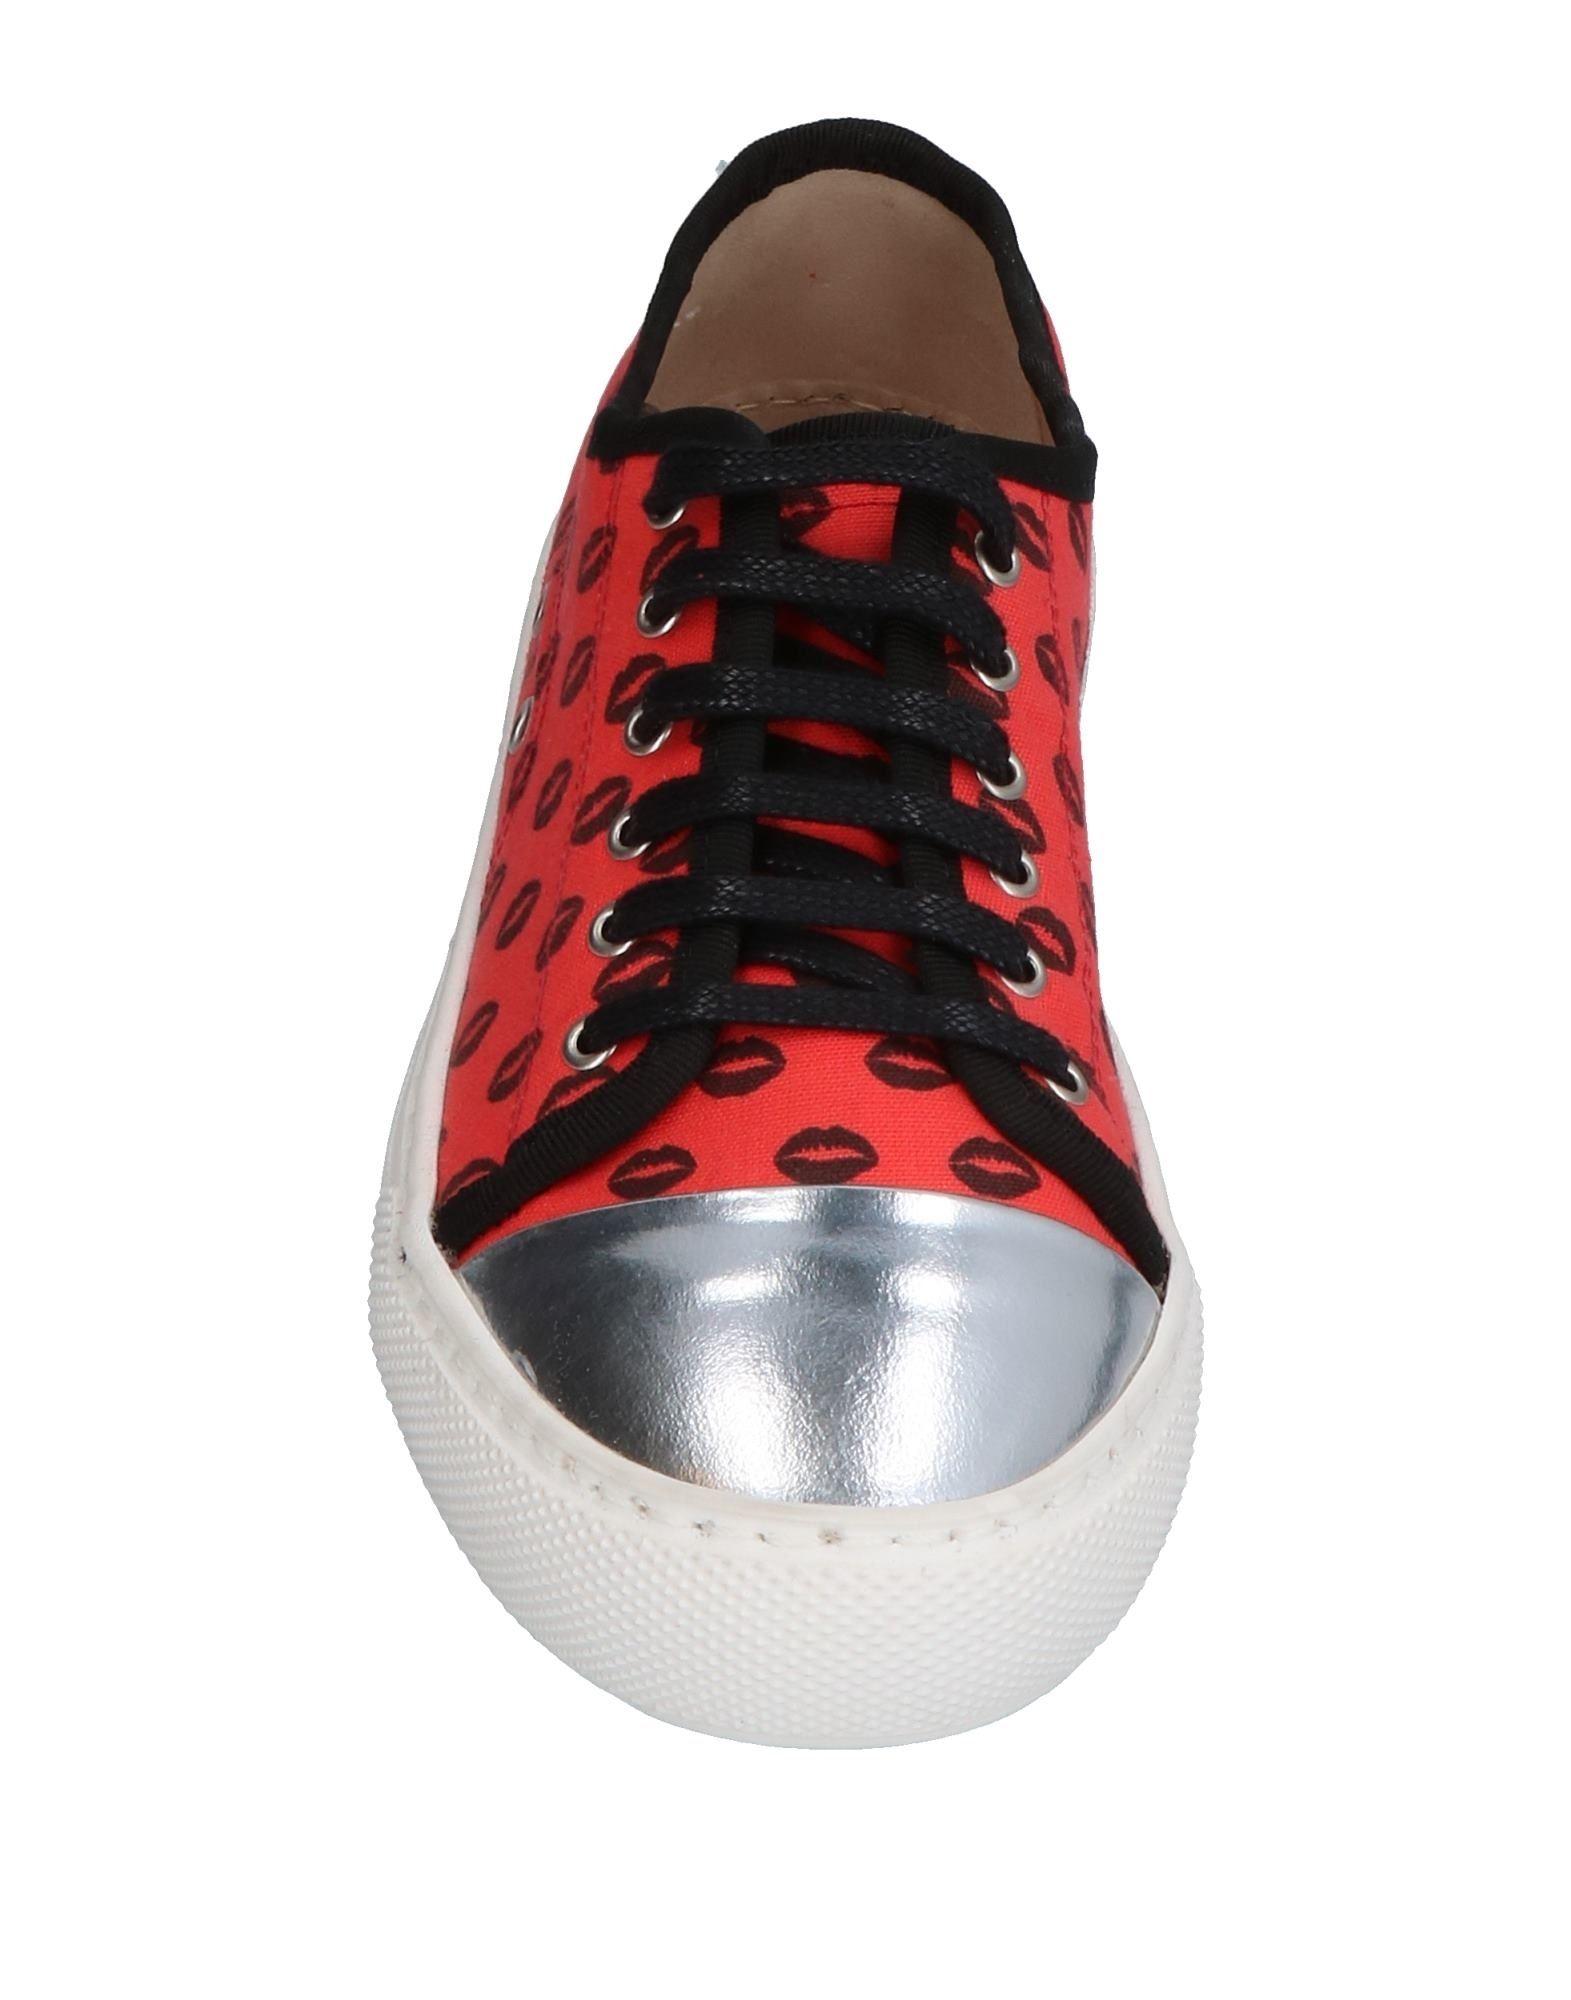 Sneakers Markus Lupfer Femme - Sneakers Markus Lupfer sur